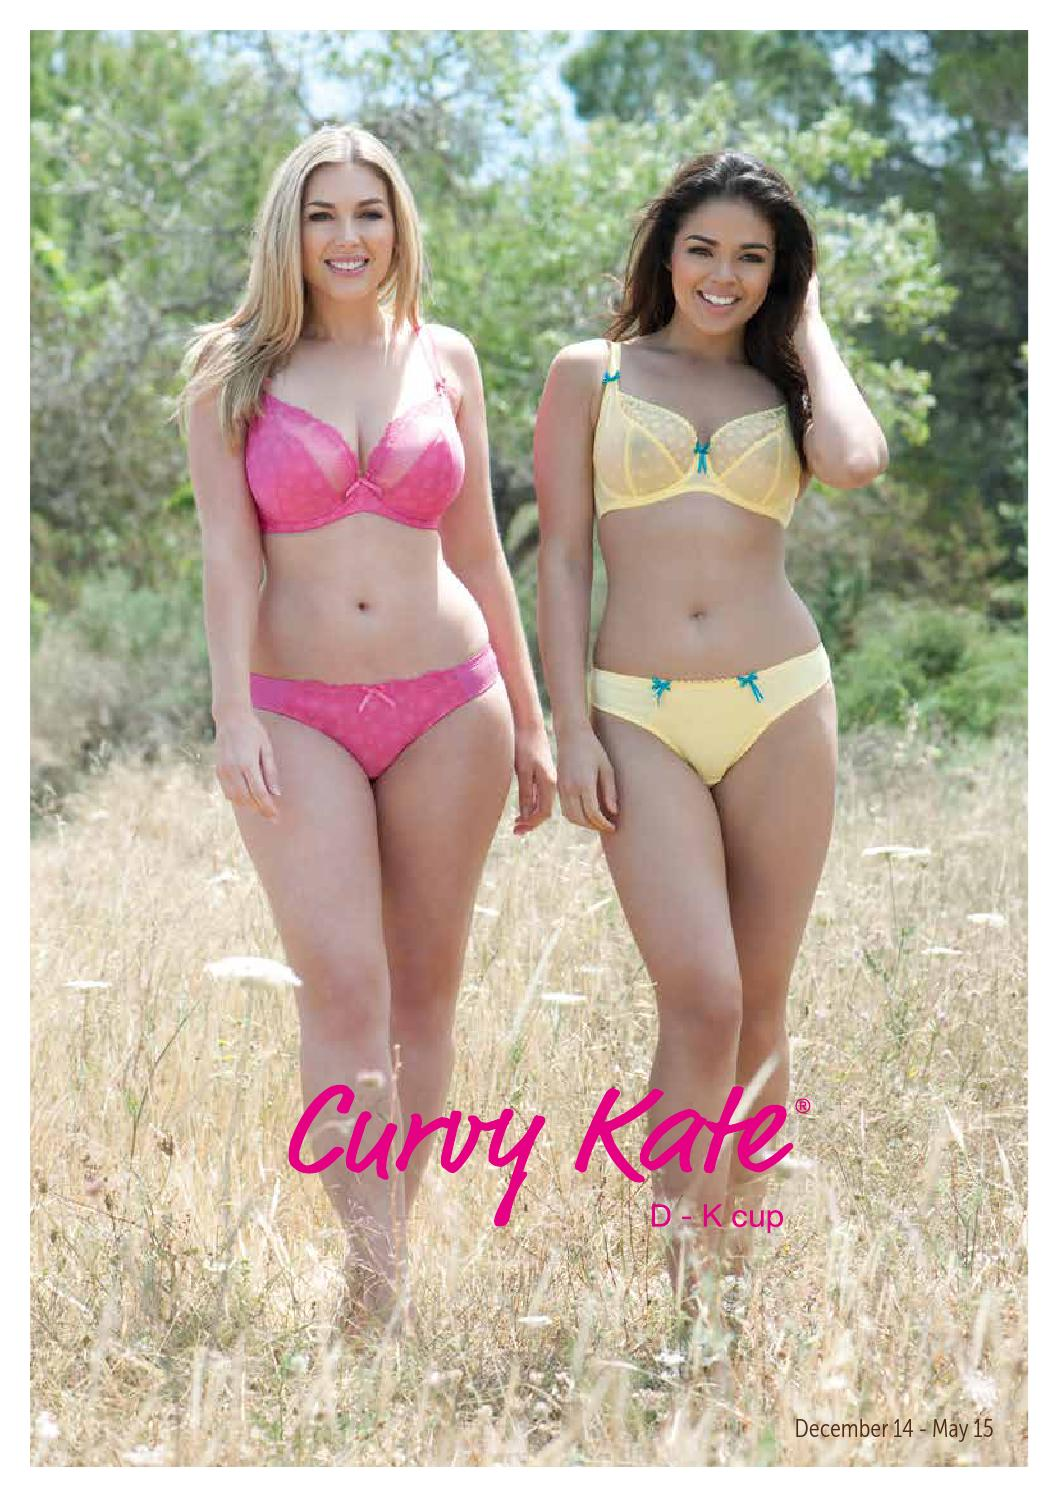 Brand New Curvy Kate Daily Boost Smooth Everyday Bra CK1801 Black